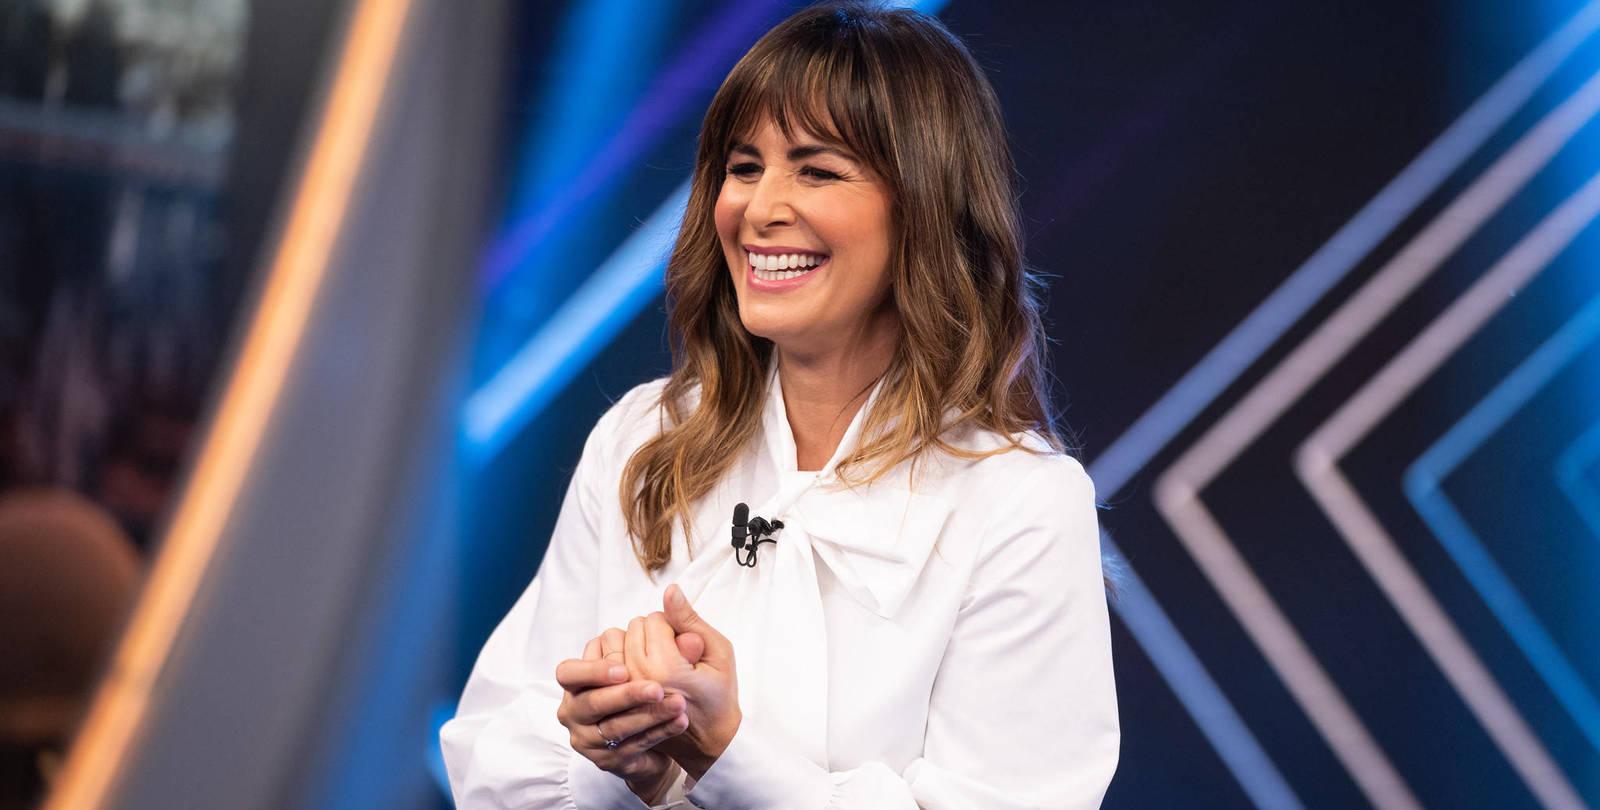 Nuria Roca, presentadora d'un programa nou - Antena 3